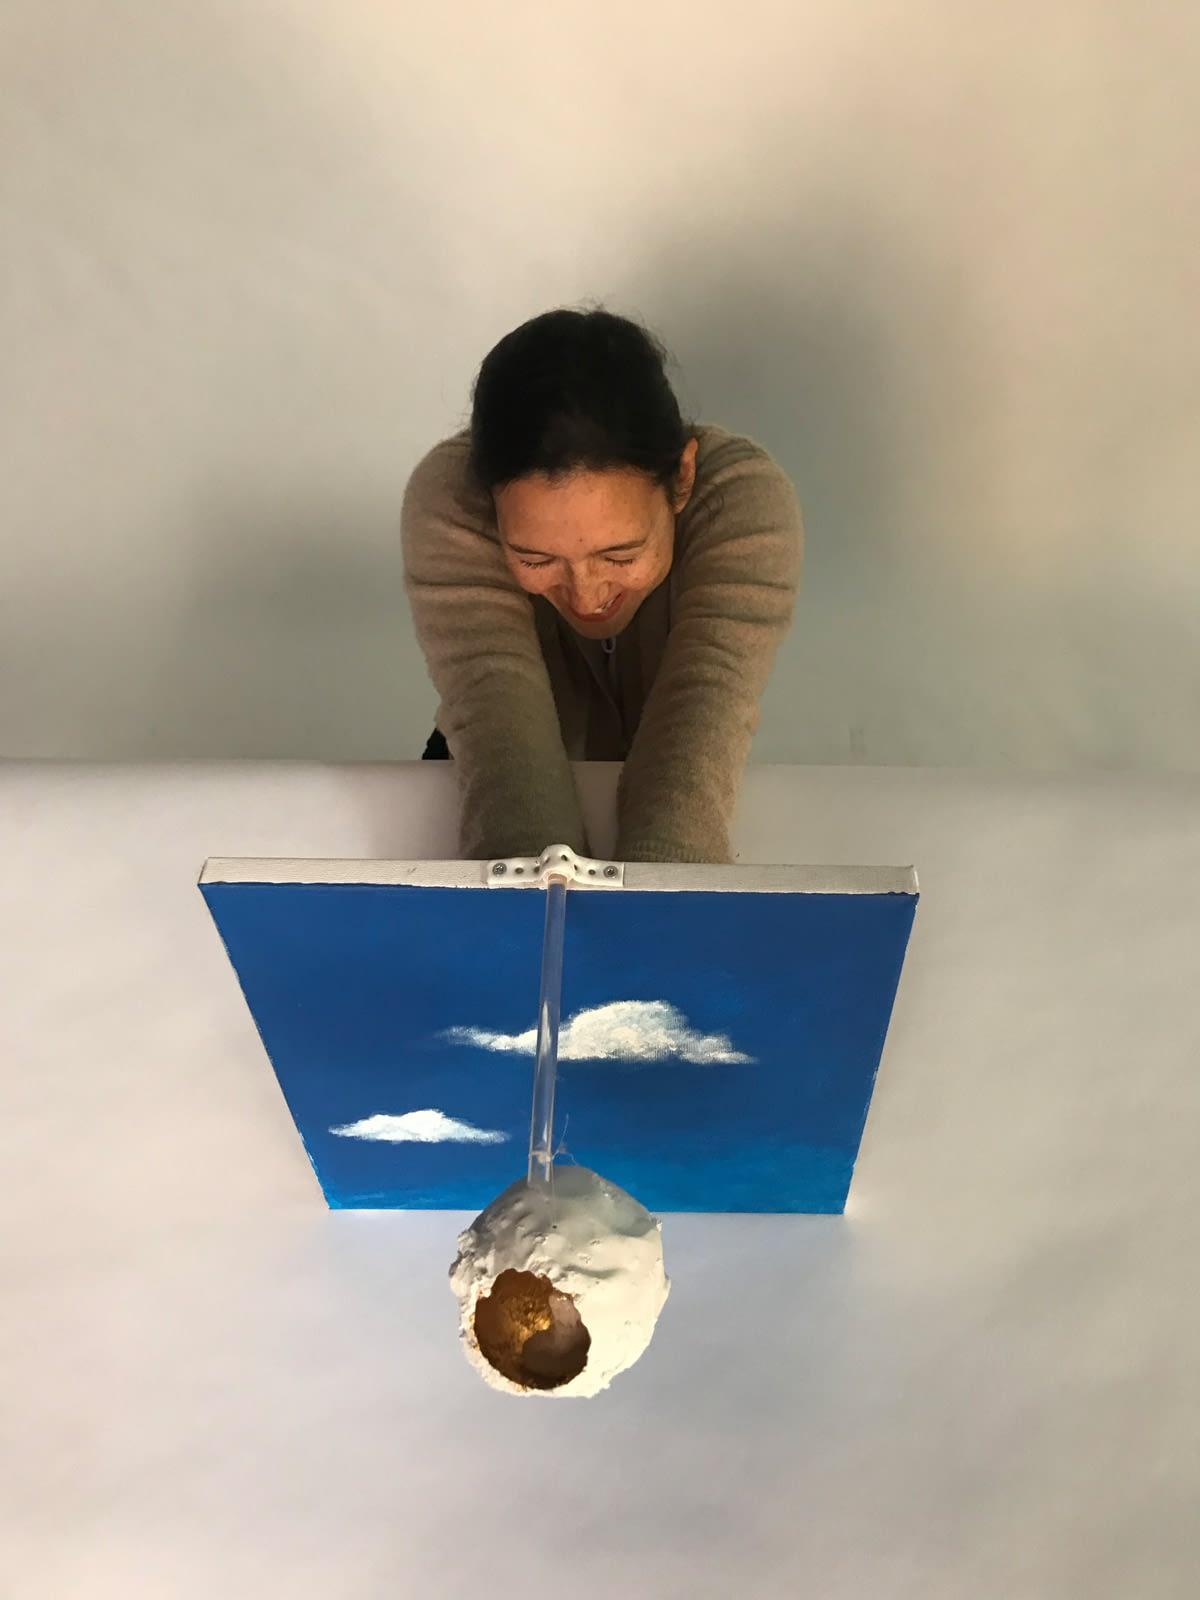 Making-Of ... JDO - Julia Drenhaus Omori by STEMUTZ, bluefactory, 17.10.2018